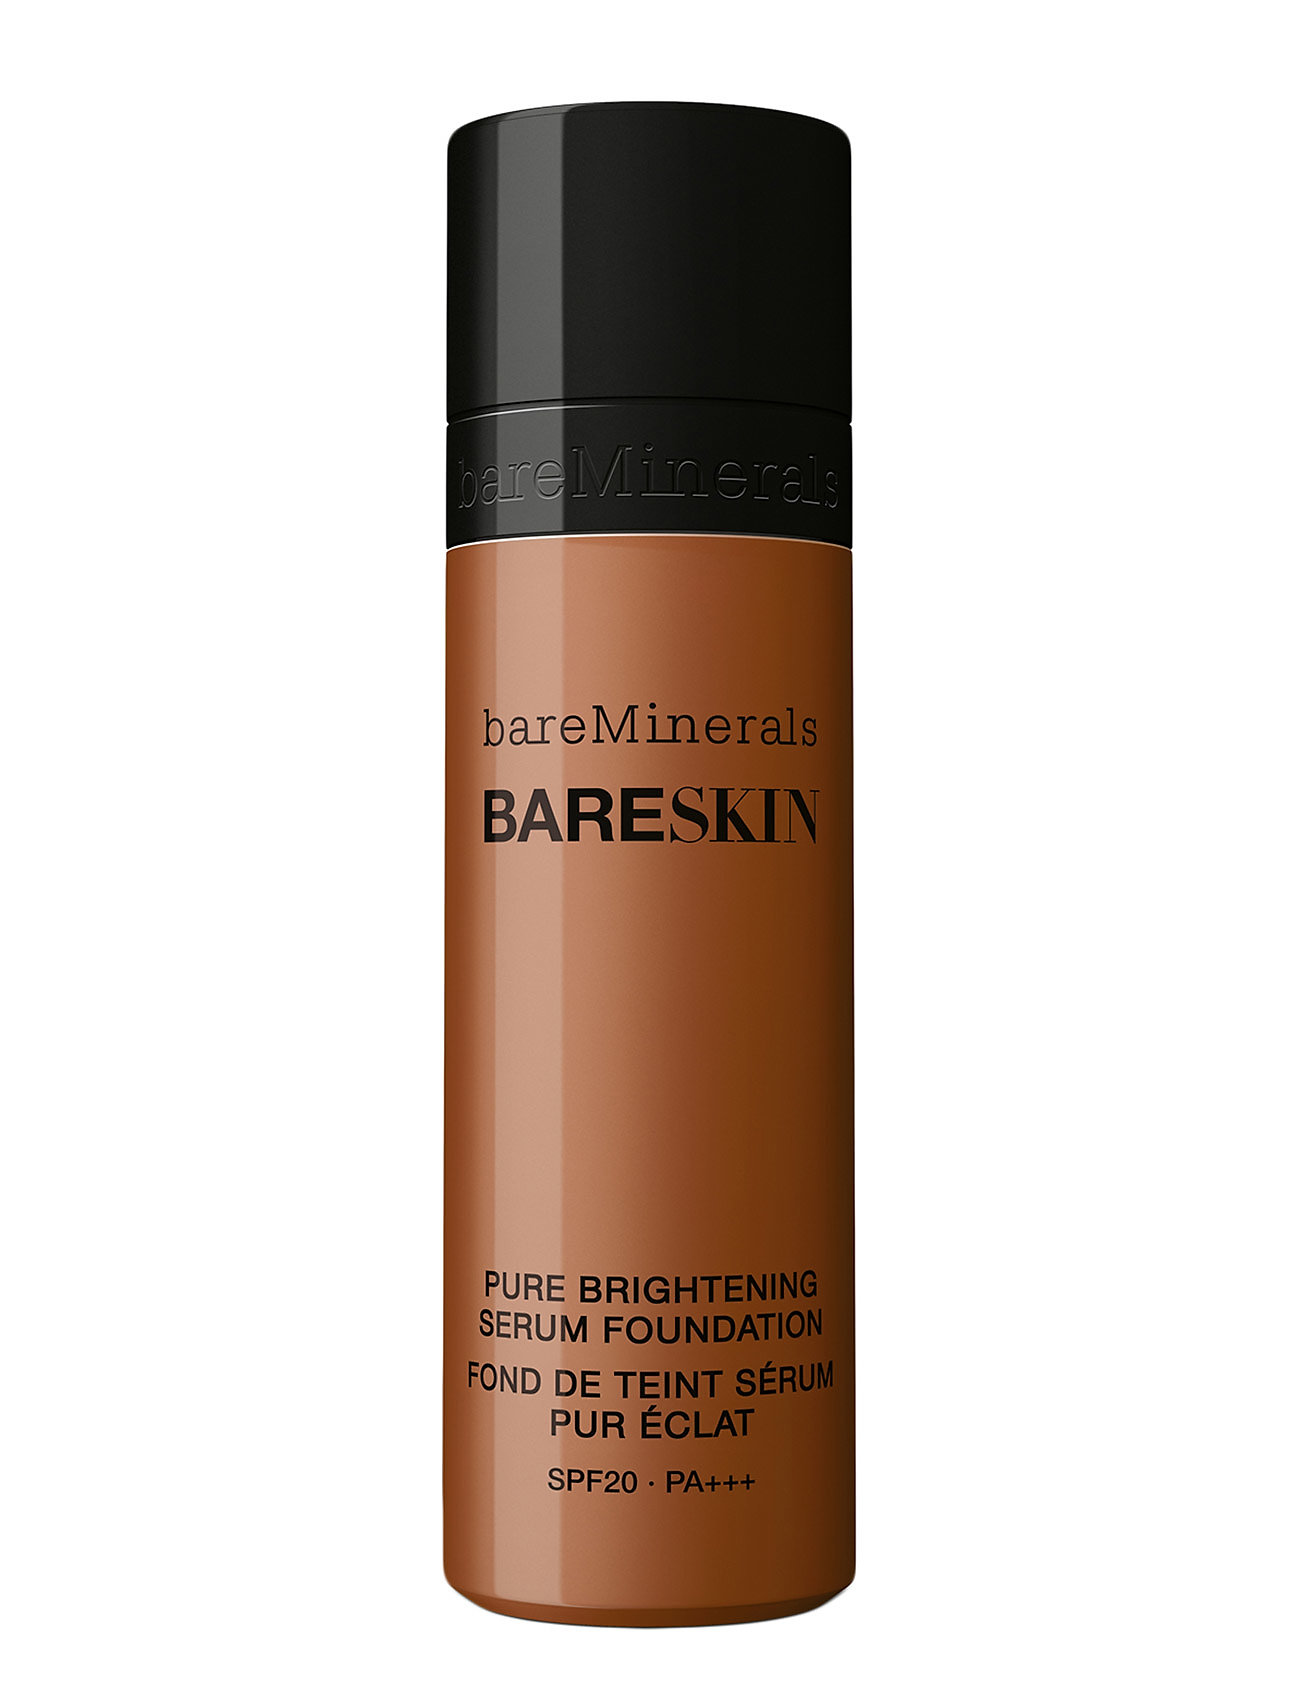 Image of Bareskin Pure Brightening Serum Foundation Spf 20 Foundation Makeup BareMinerals (3067521767)